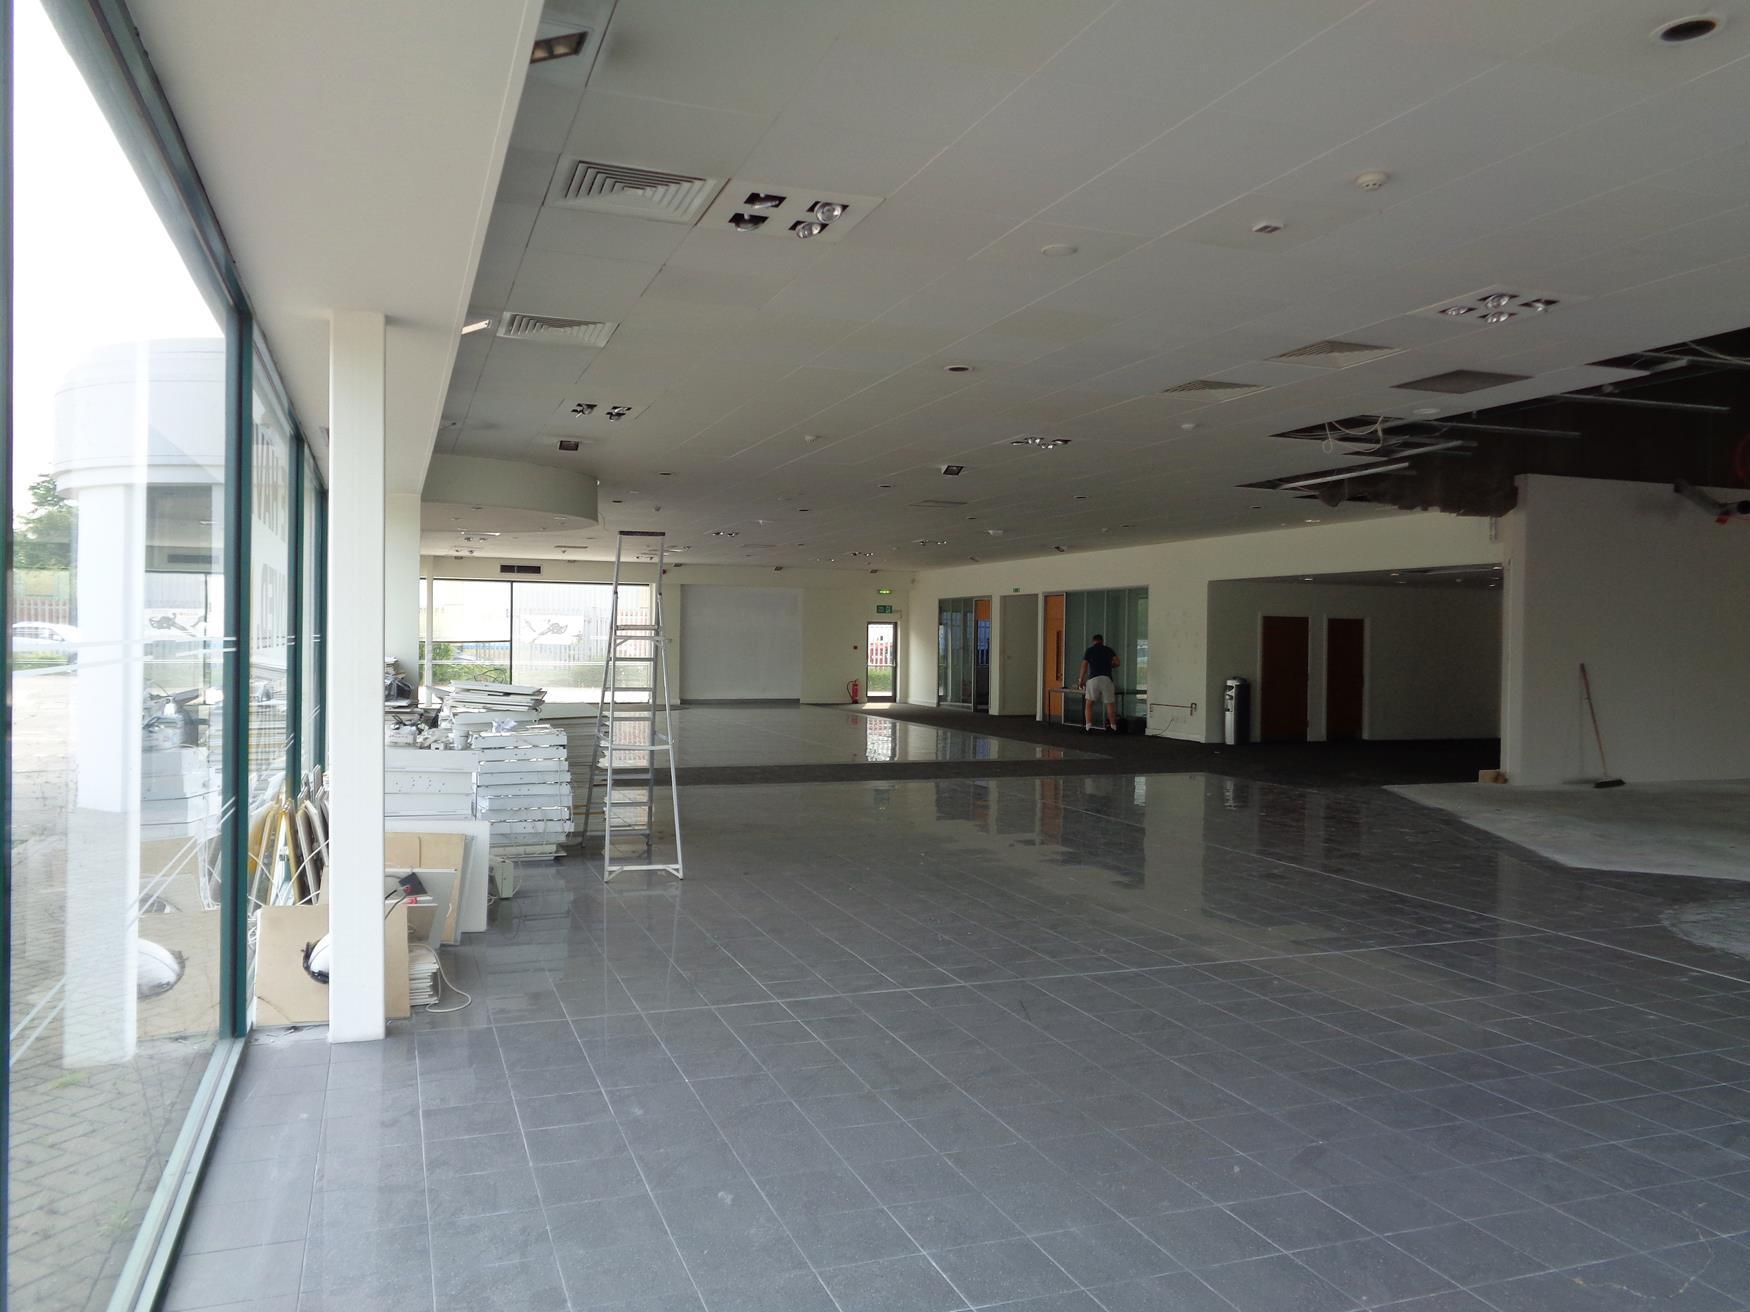 Showroom was previously jaguar dealership